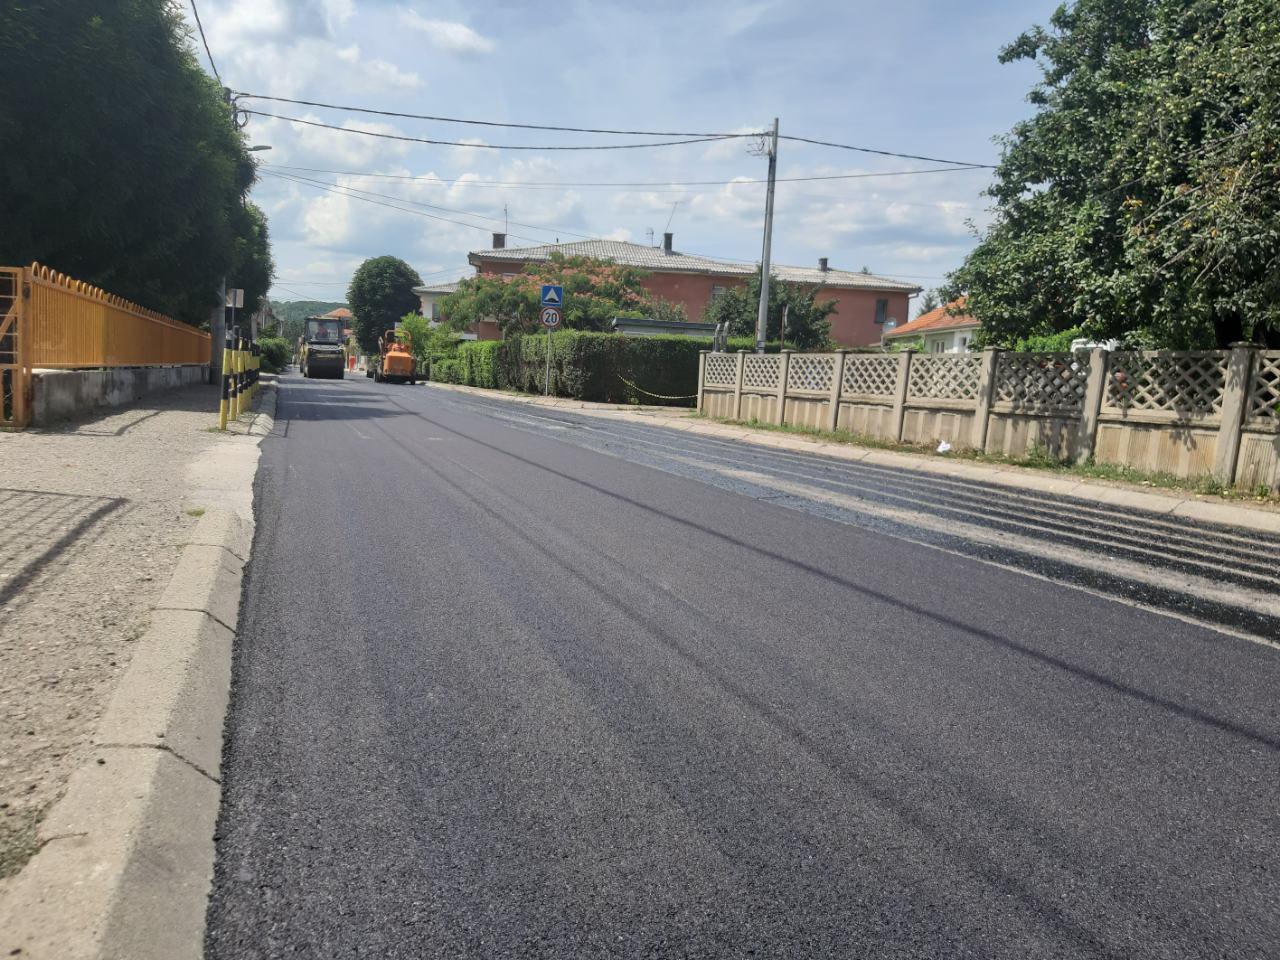 Ulica Janka Katića, foto: A.S.